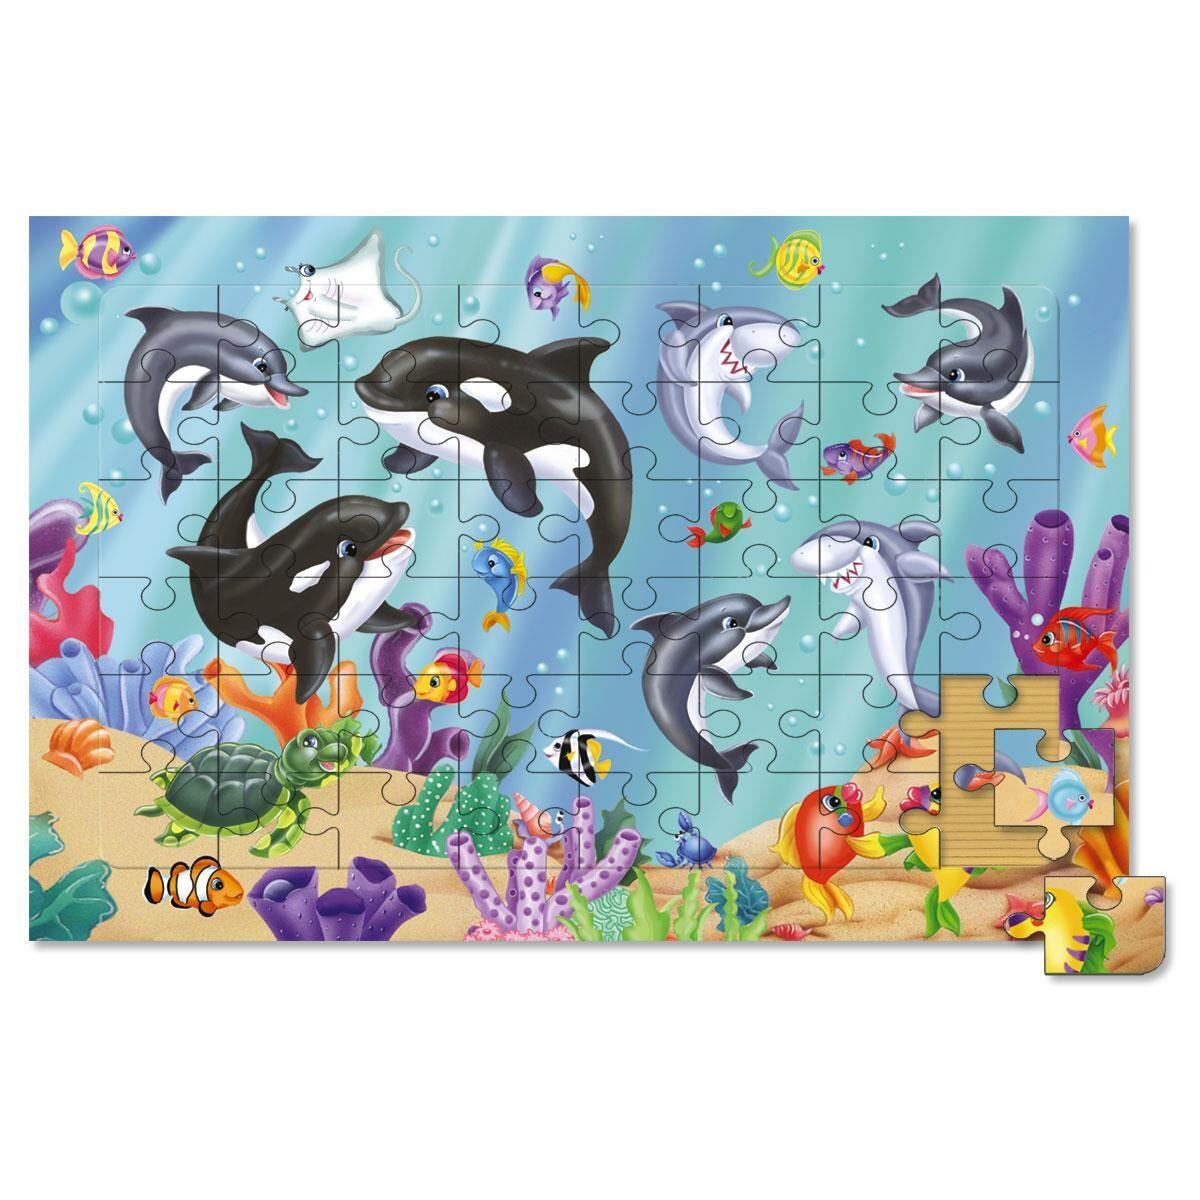 Ocean Scene Board Puzzle